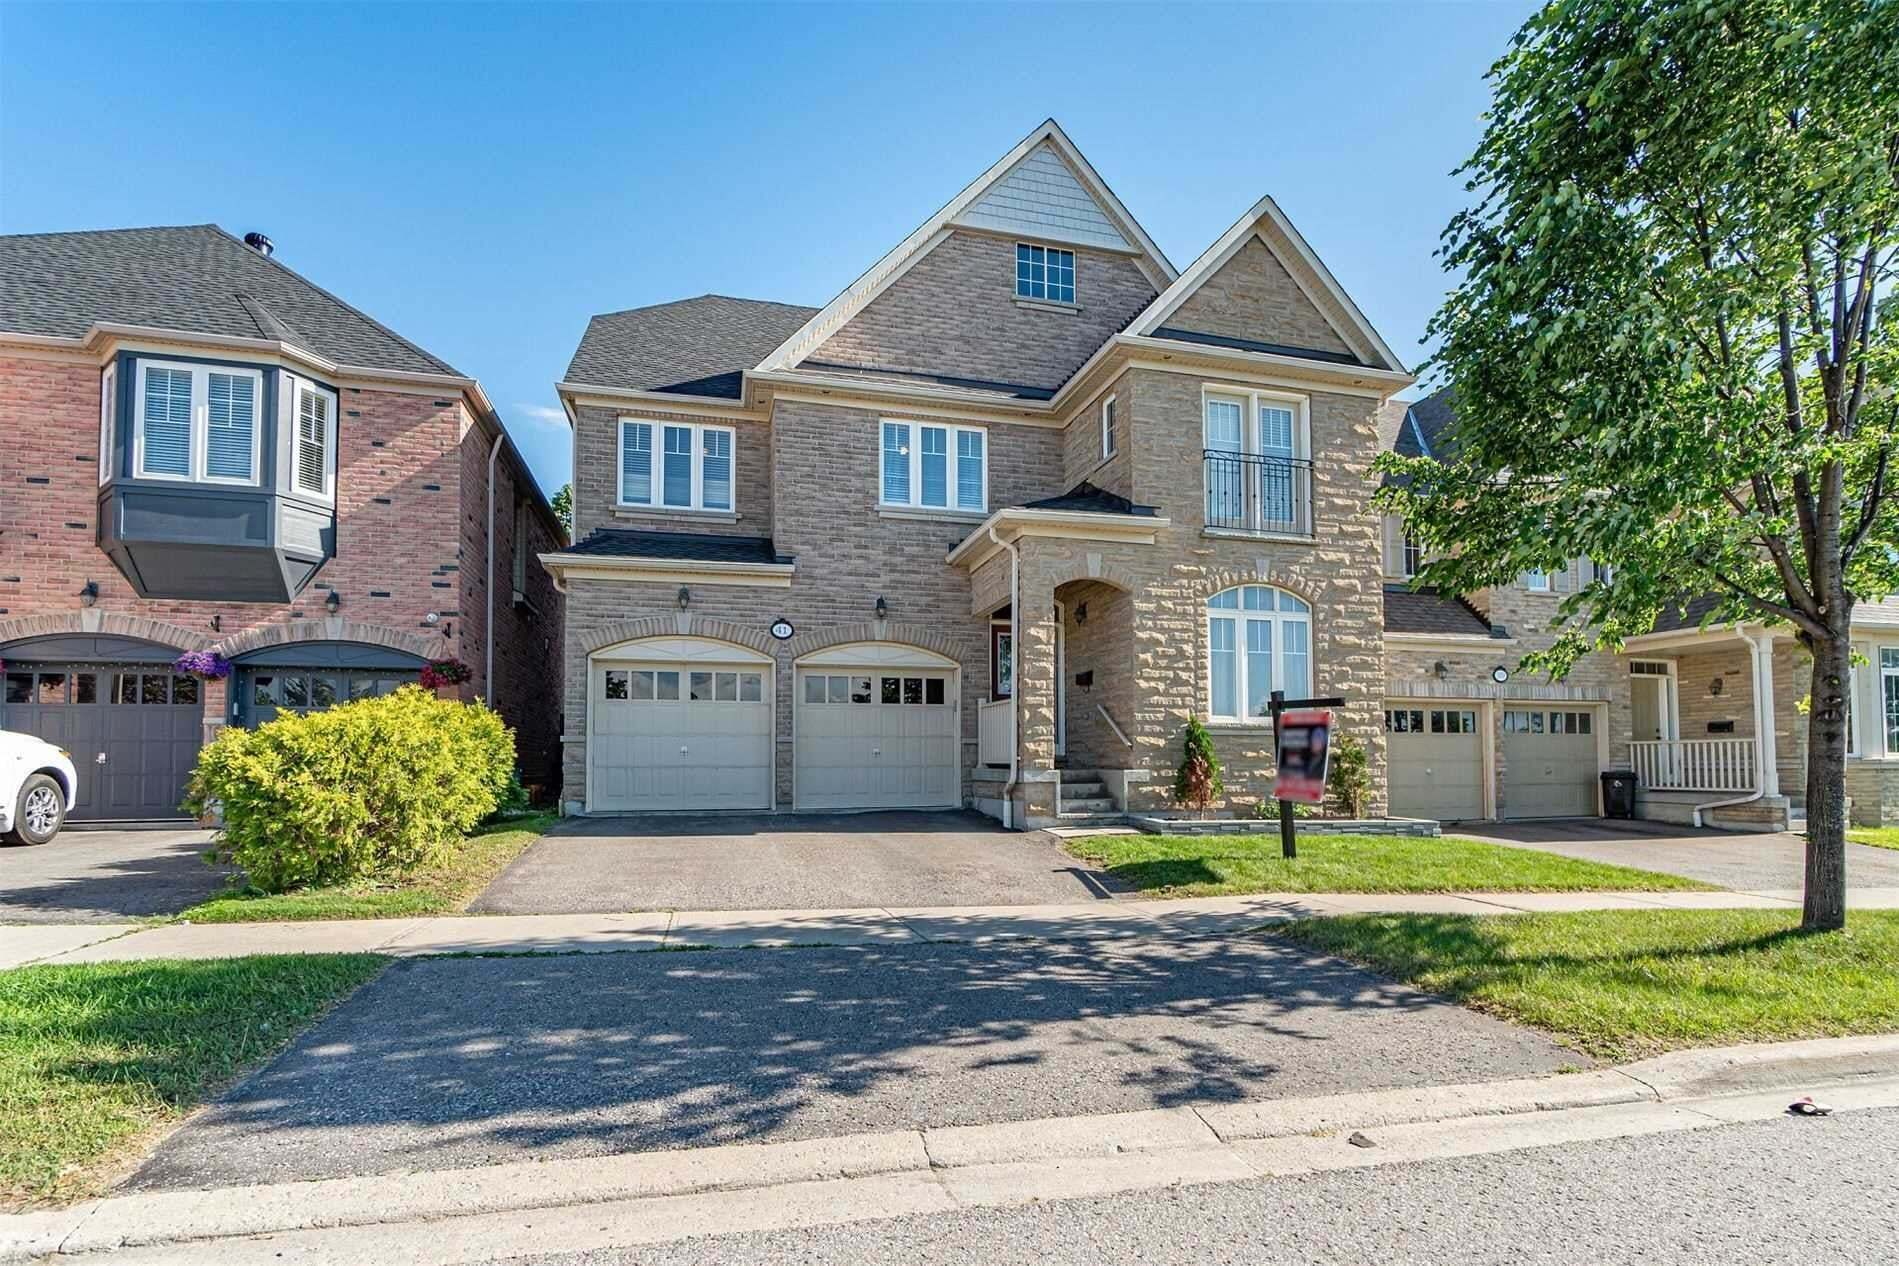 House for sale at 41 Bambridge St Ajax Ontario - MLS: E4783320